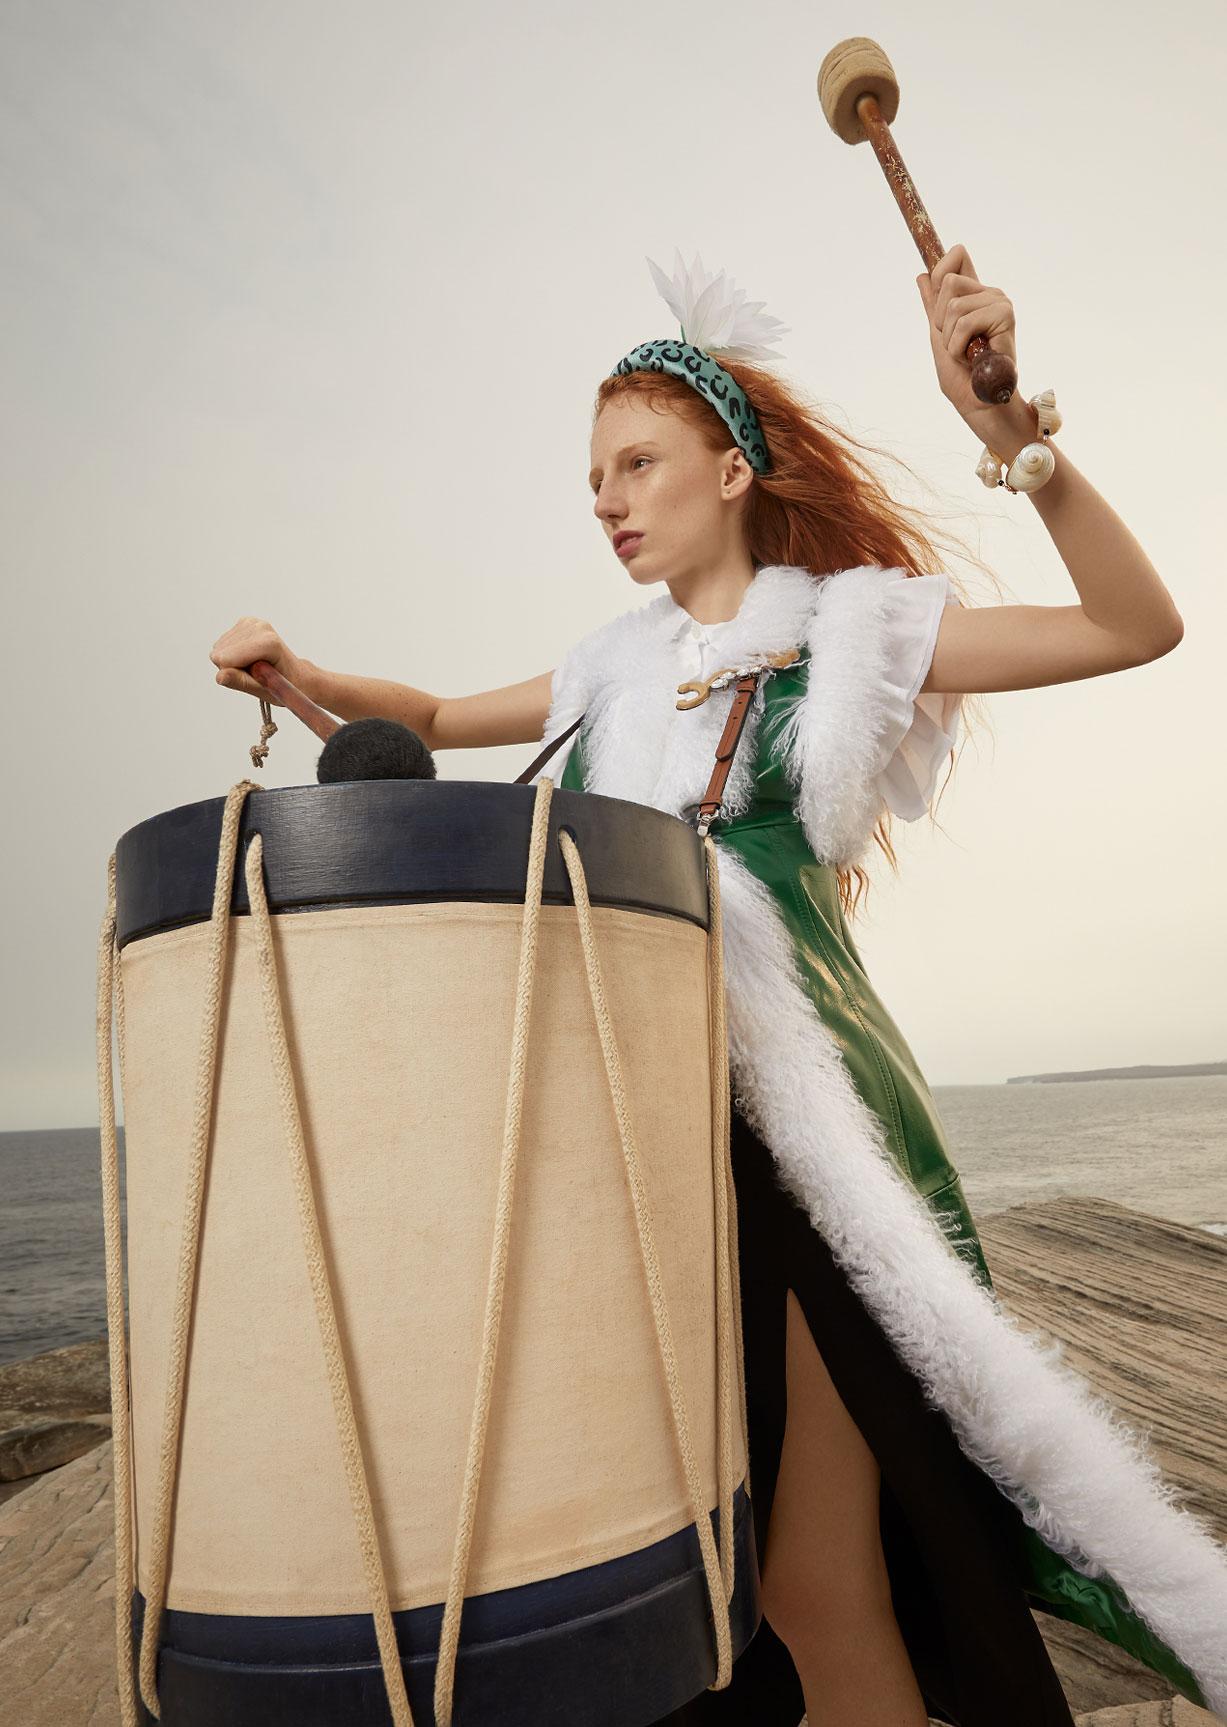 Модный маскарад в журнале Grazia / фото 13